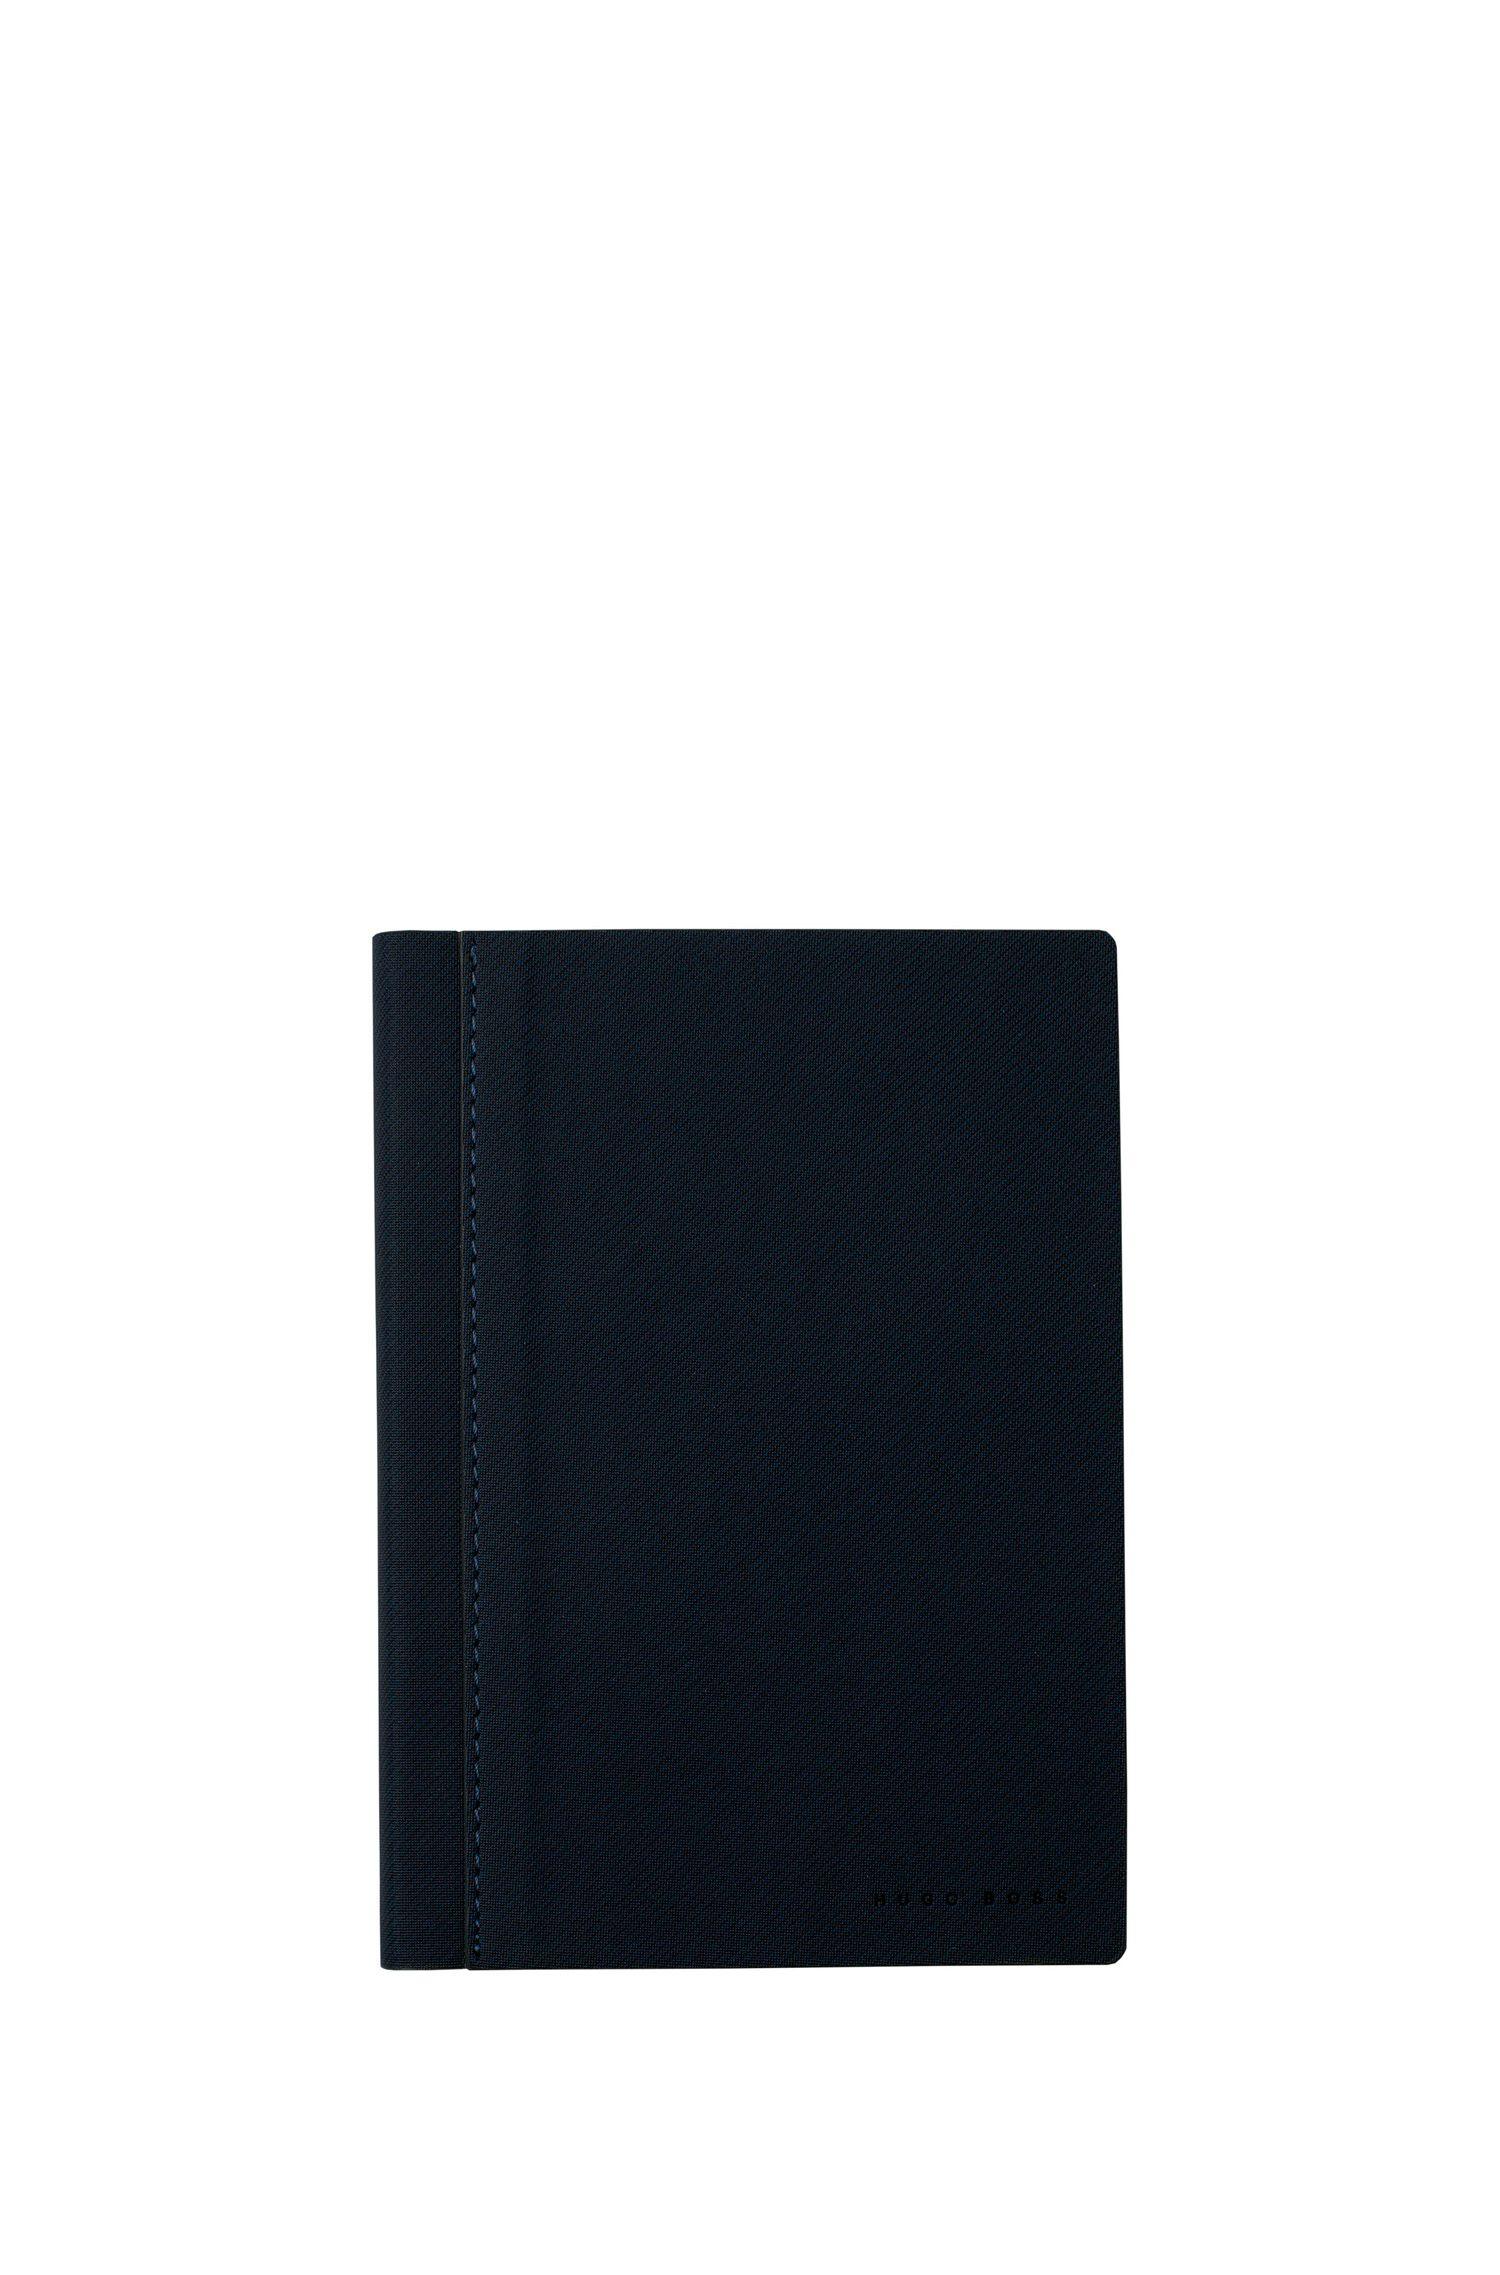 A6 notebook in dark-blue textured fabric